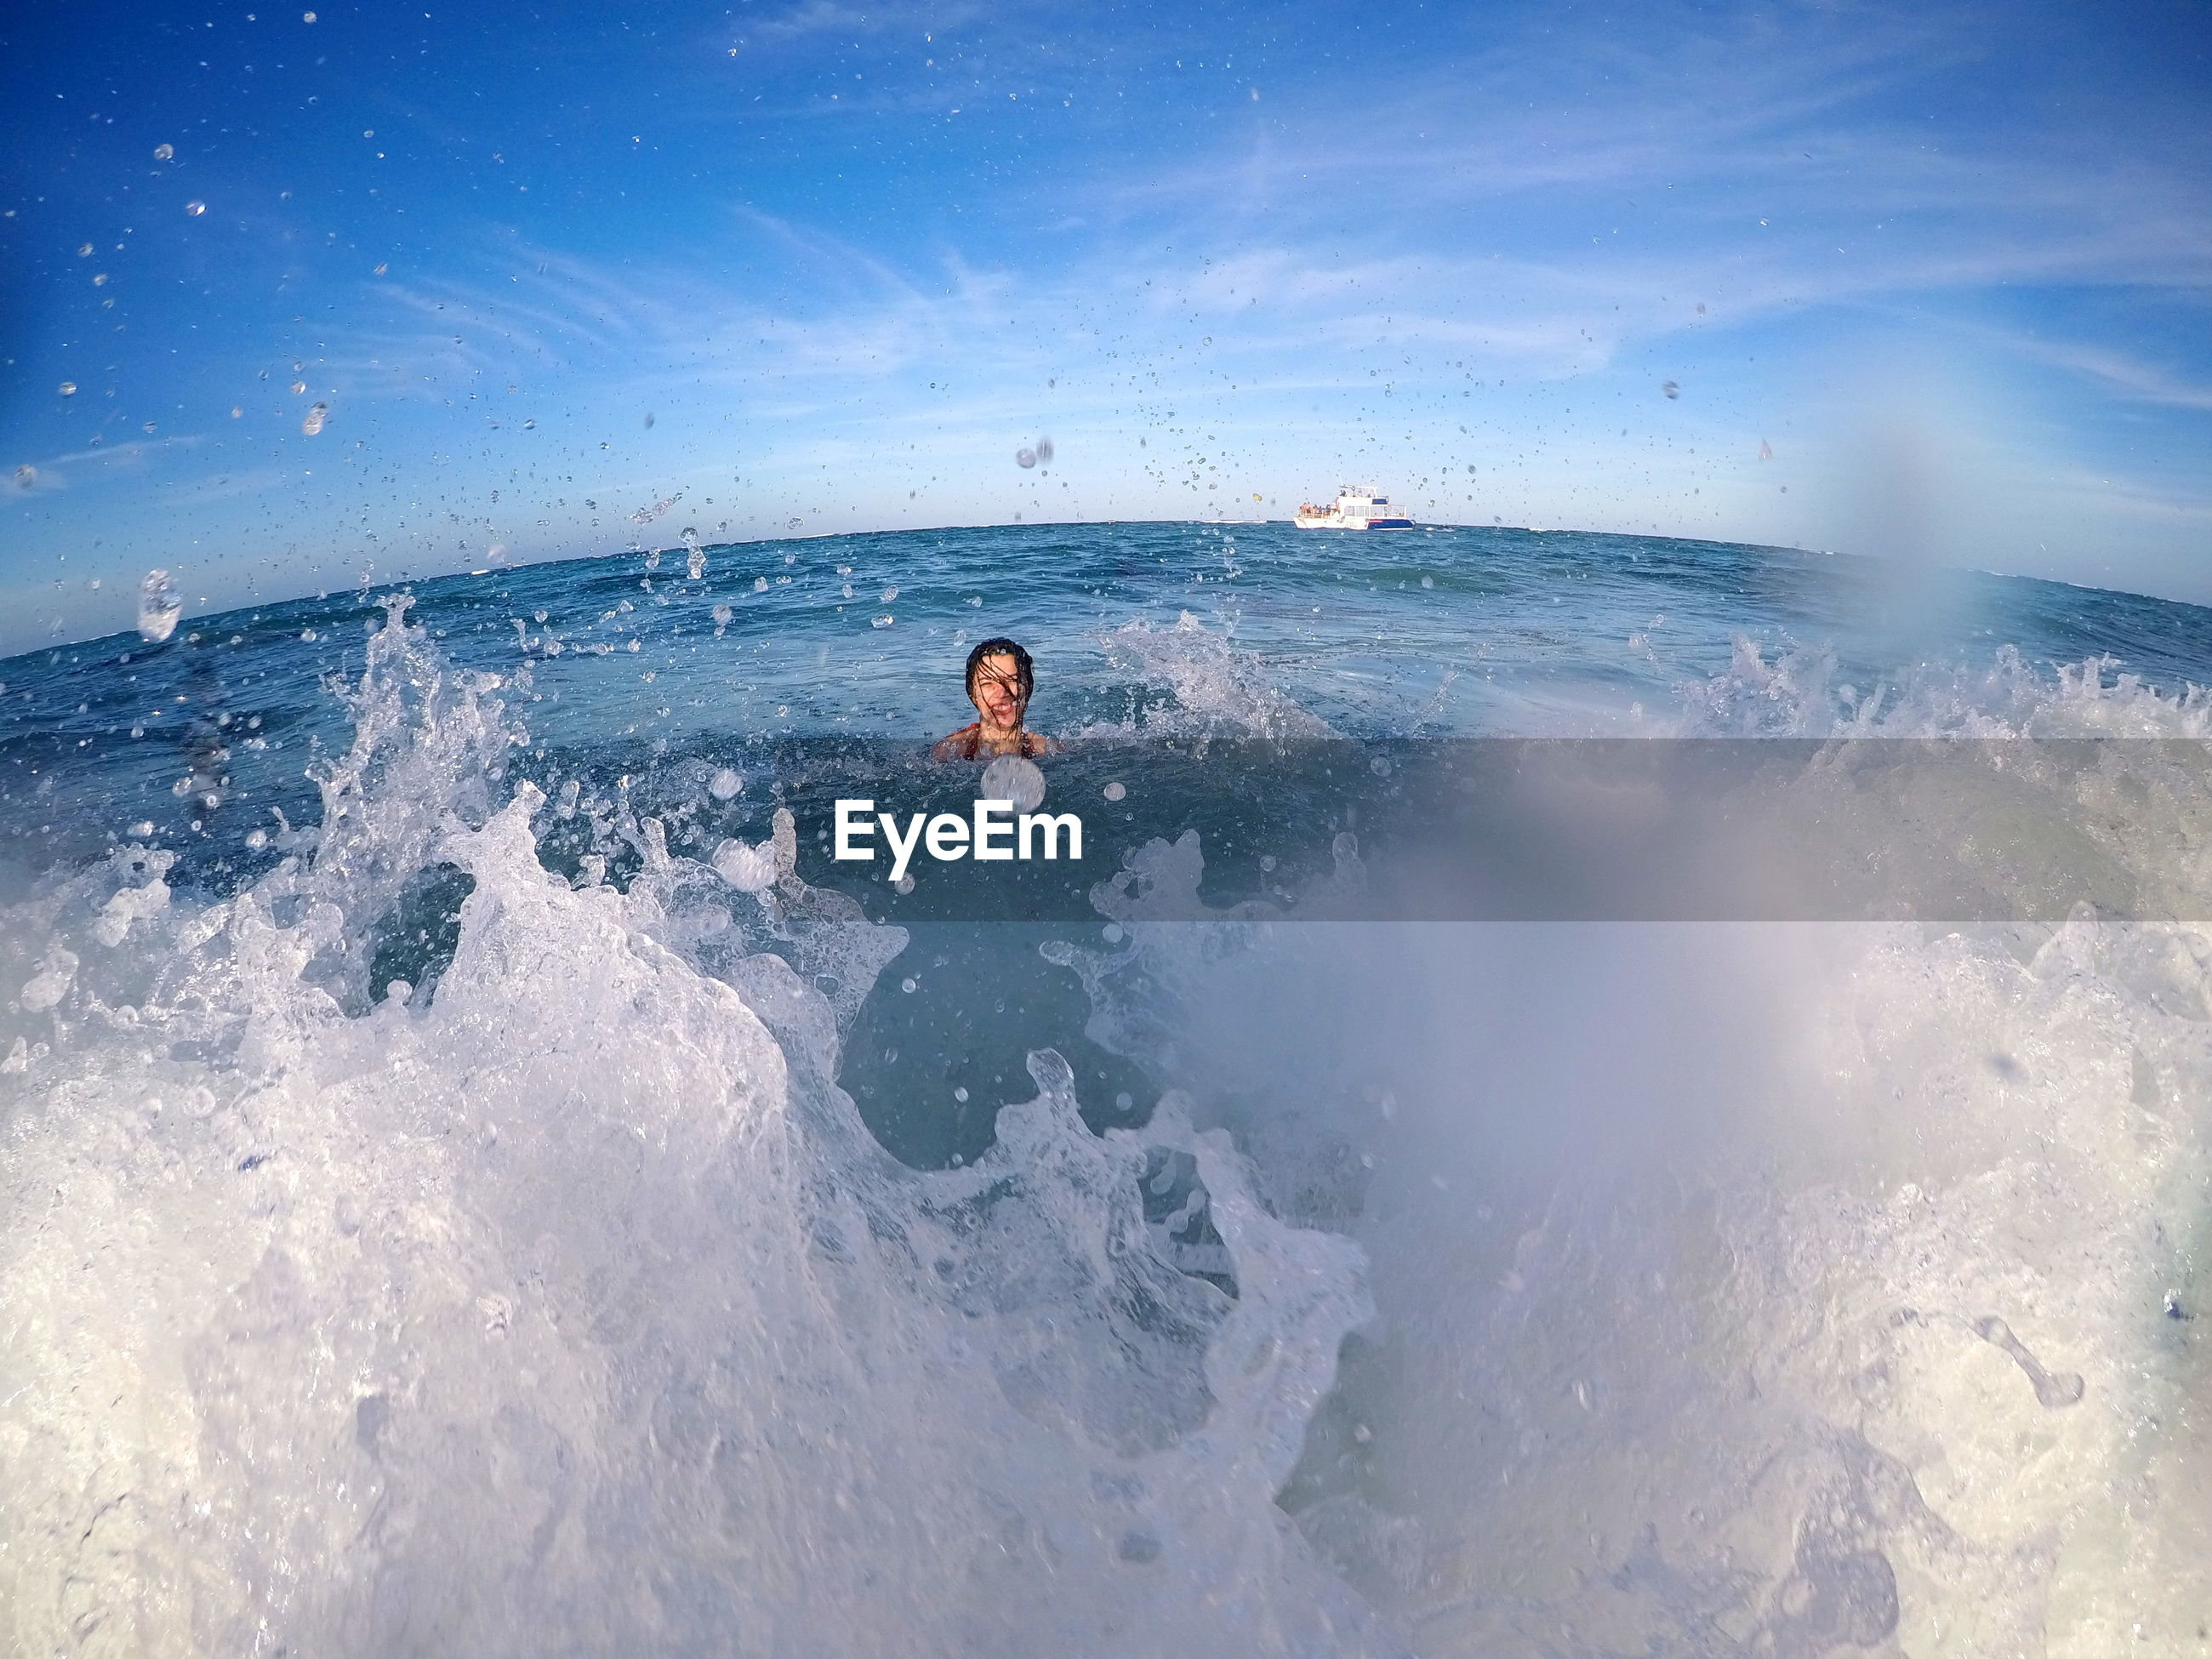 Water splashing on woman in sea